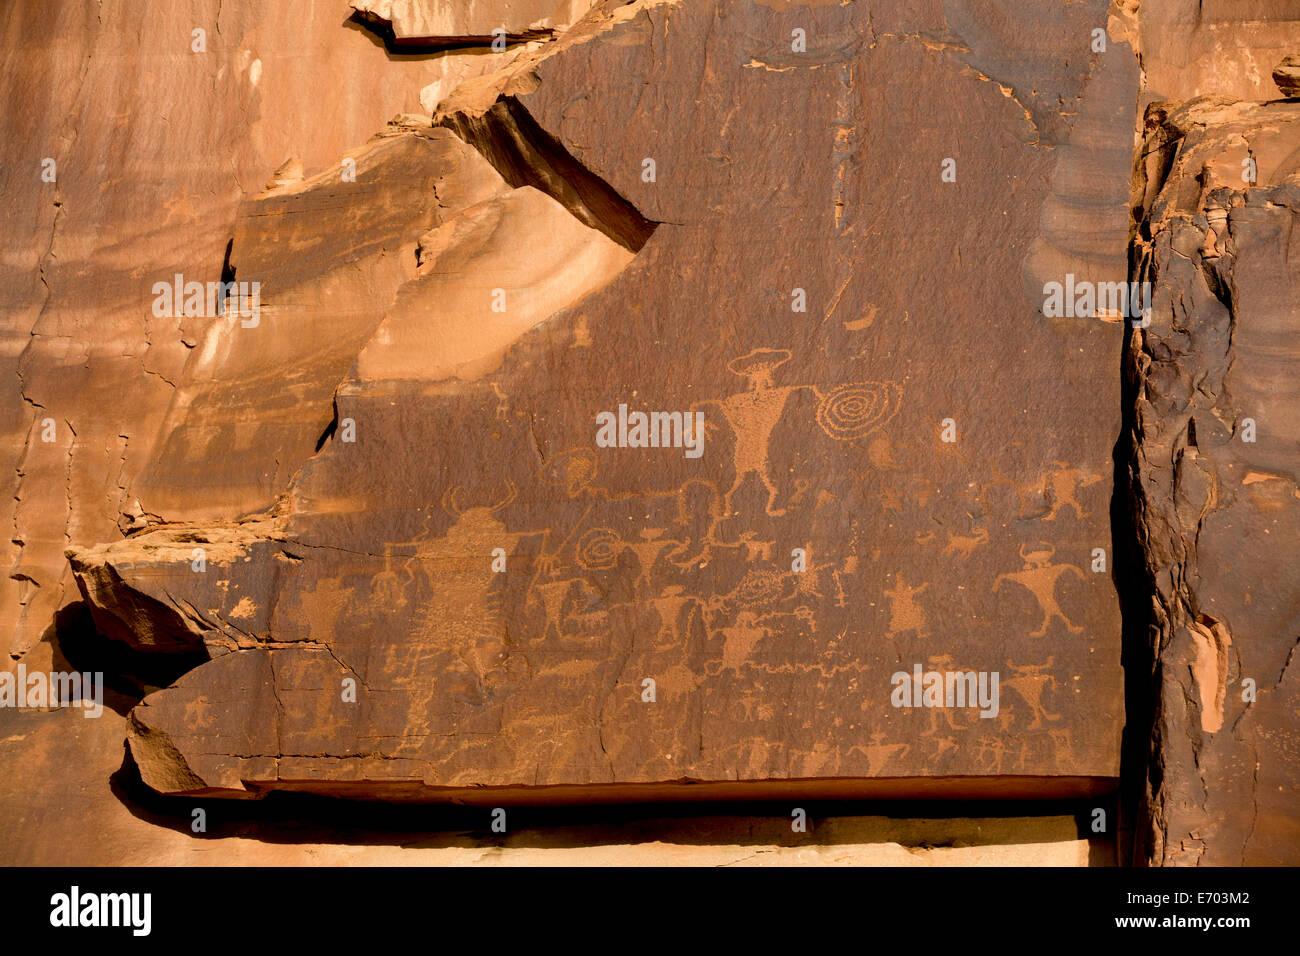 USA, Utah, Potash Road, near Moab, petroglyphs, ancestral puebloan, AD 900 to AD 1250 Stock Photo